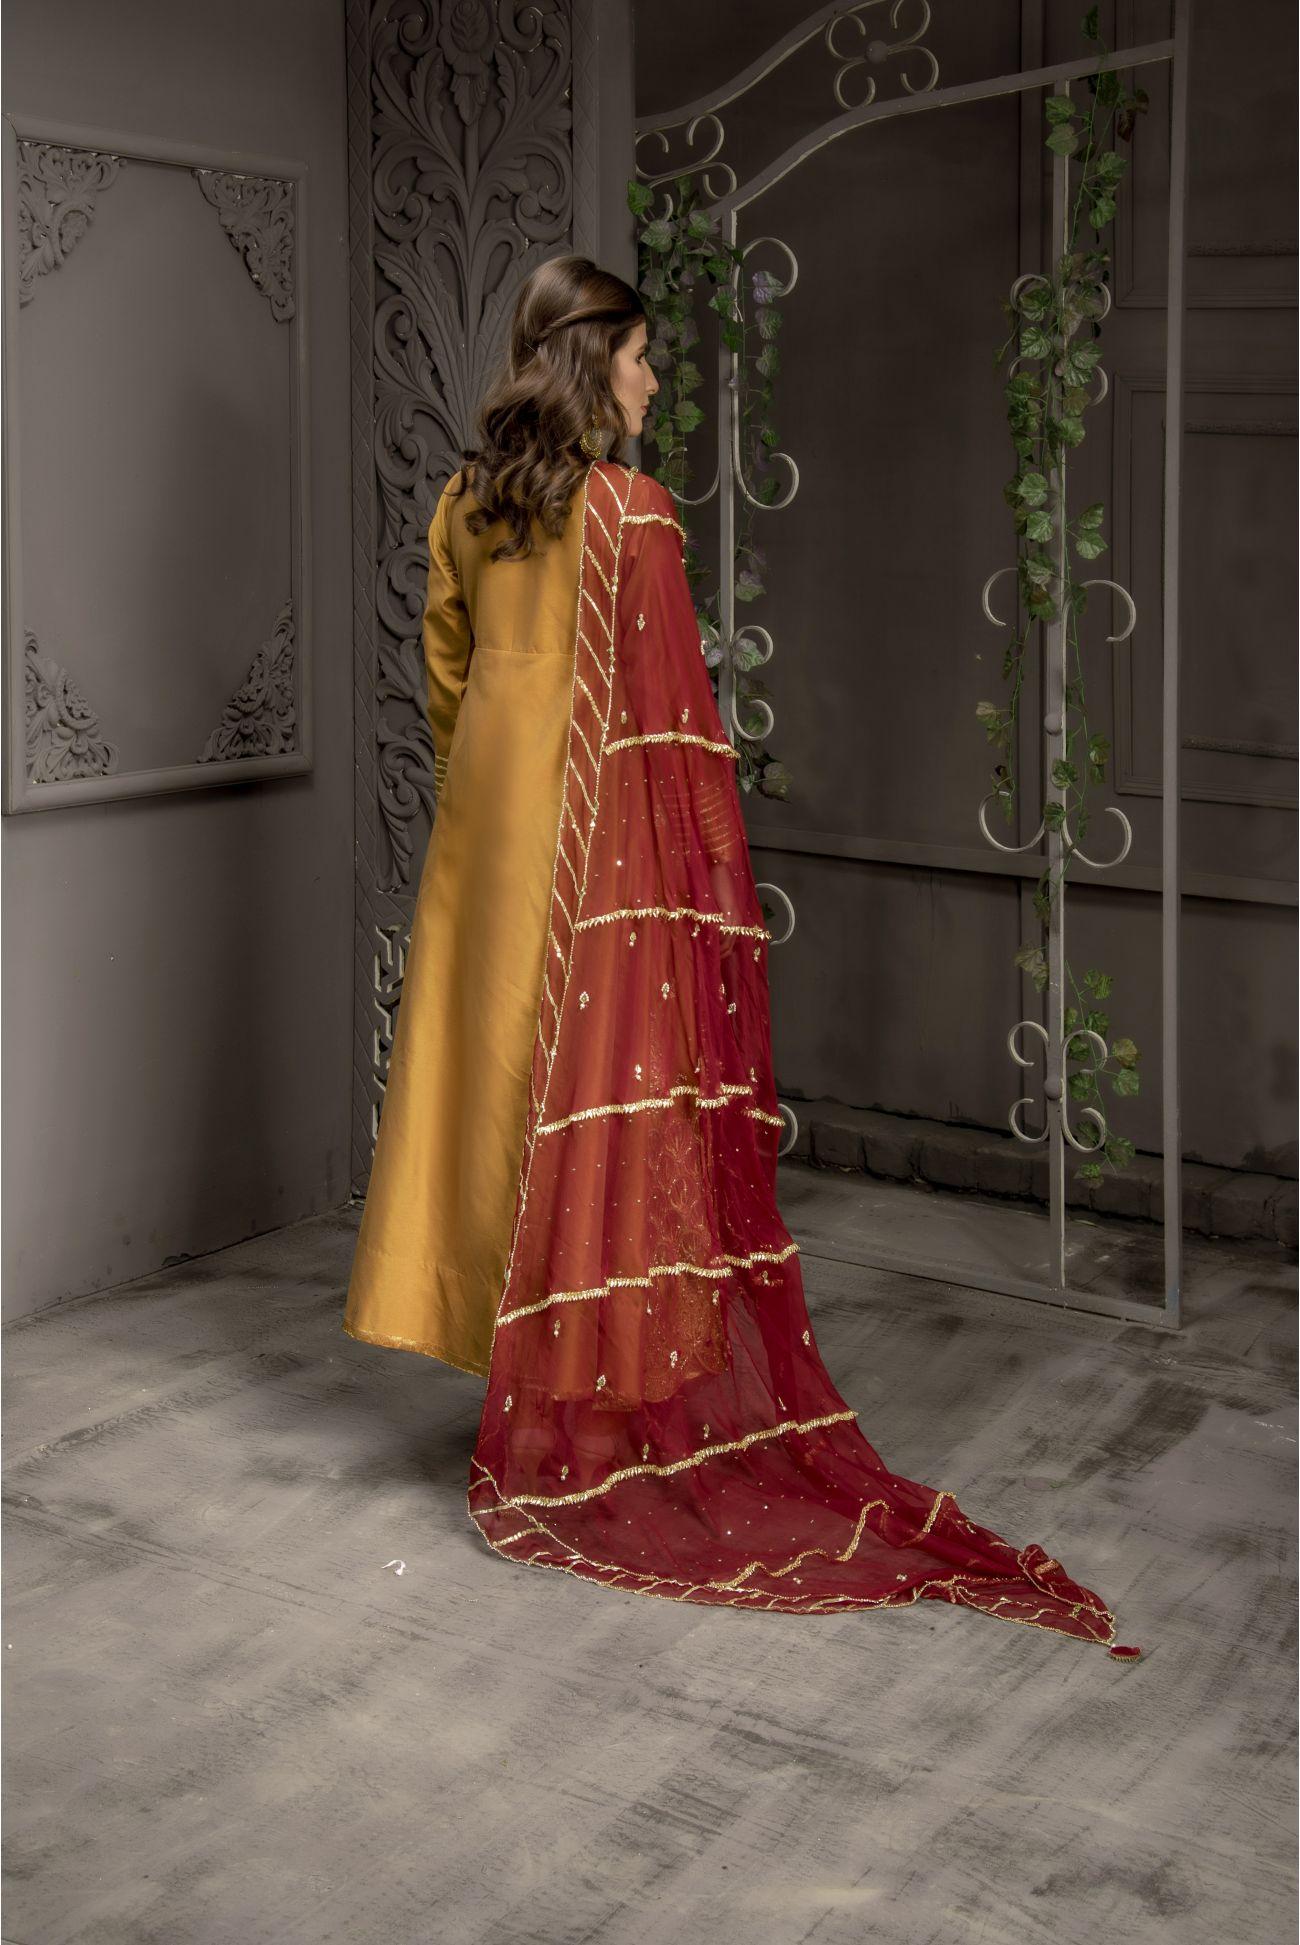 Buy Exclusive MUSAtard And Maroon Bridal Wear – Sabd218 Online In USA, Uk & Pakistan - 03